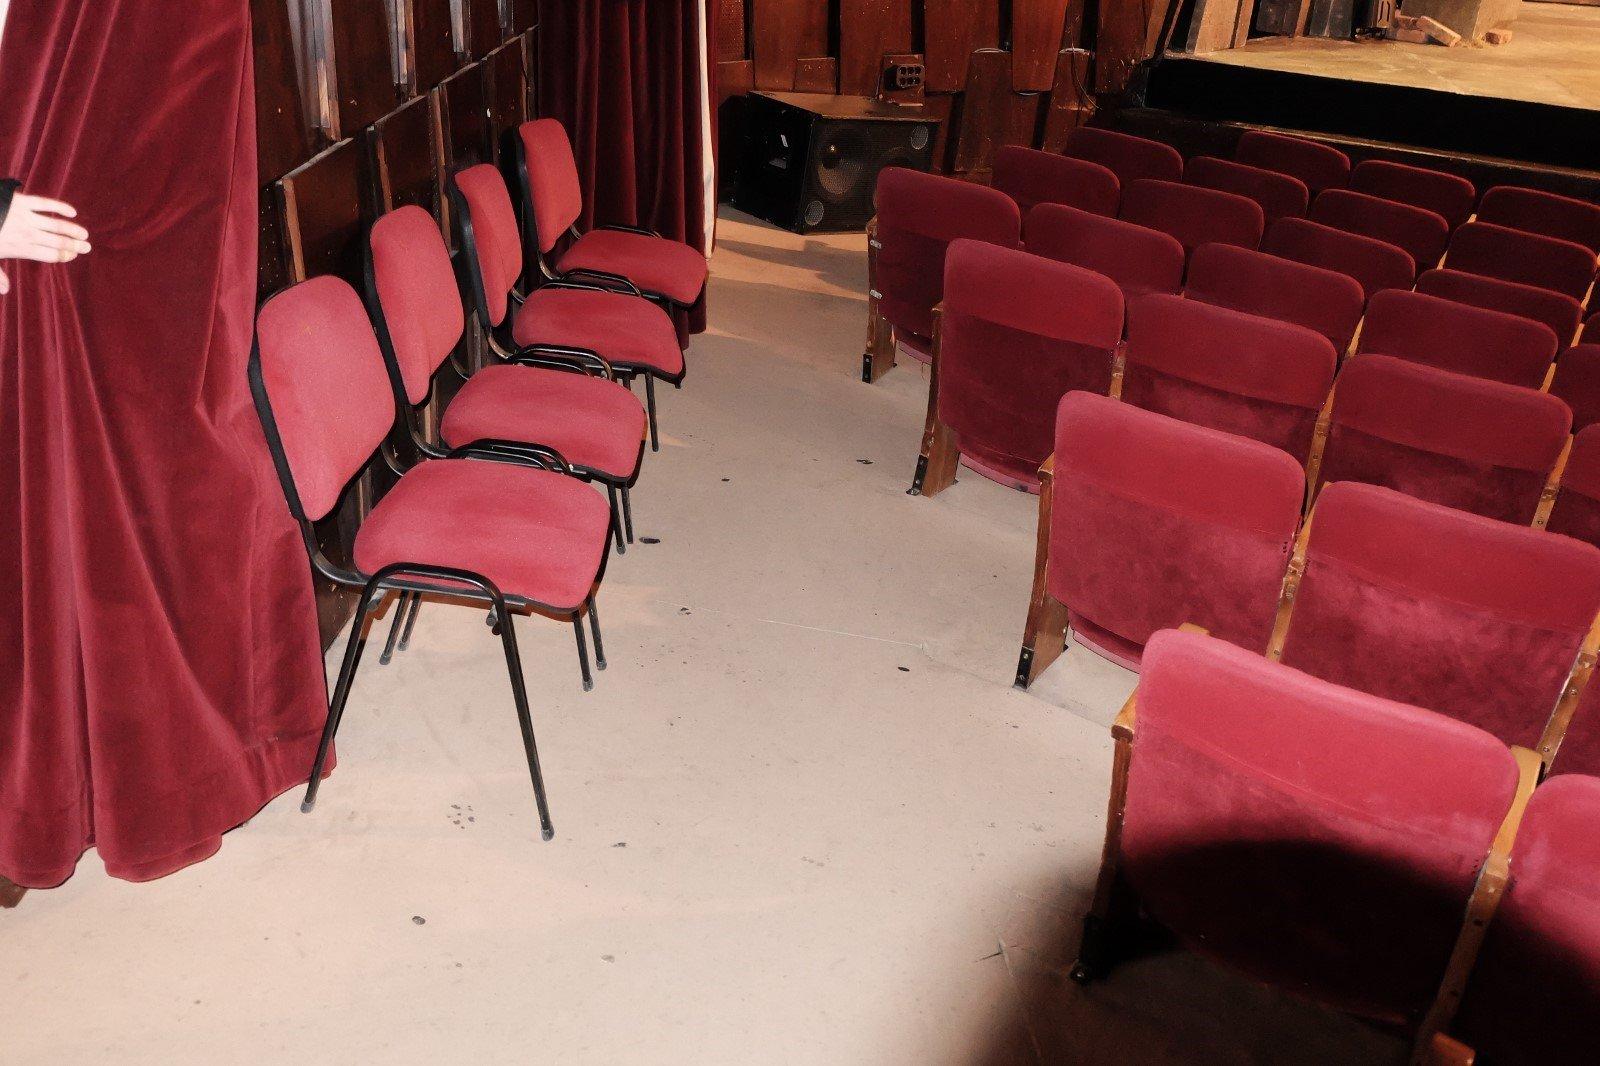 Theatre hall interior